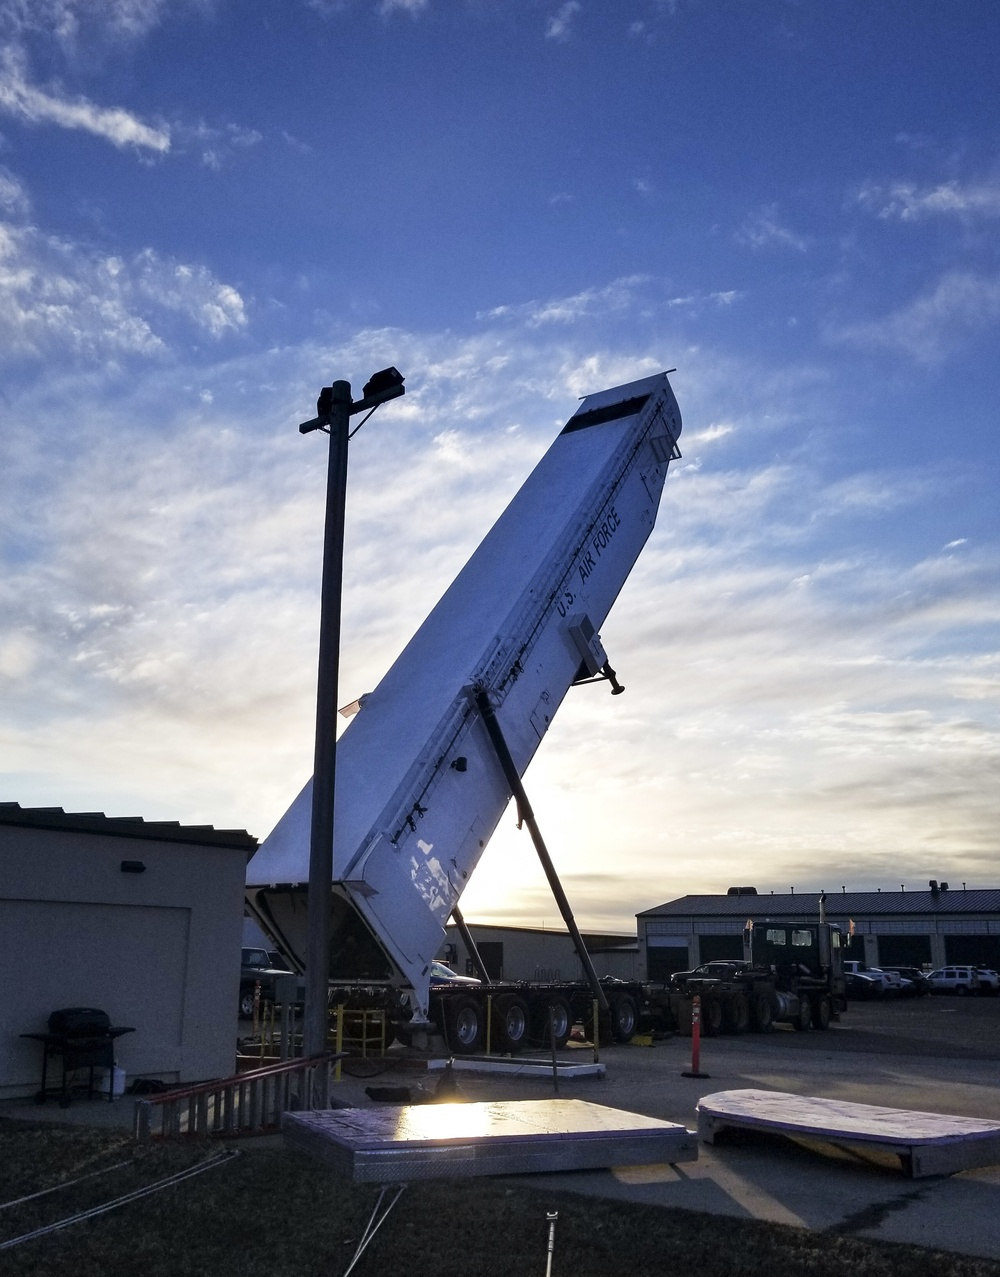 Rise & Shine: Team Minot Airmen test ICBM loading system